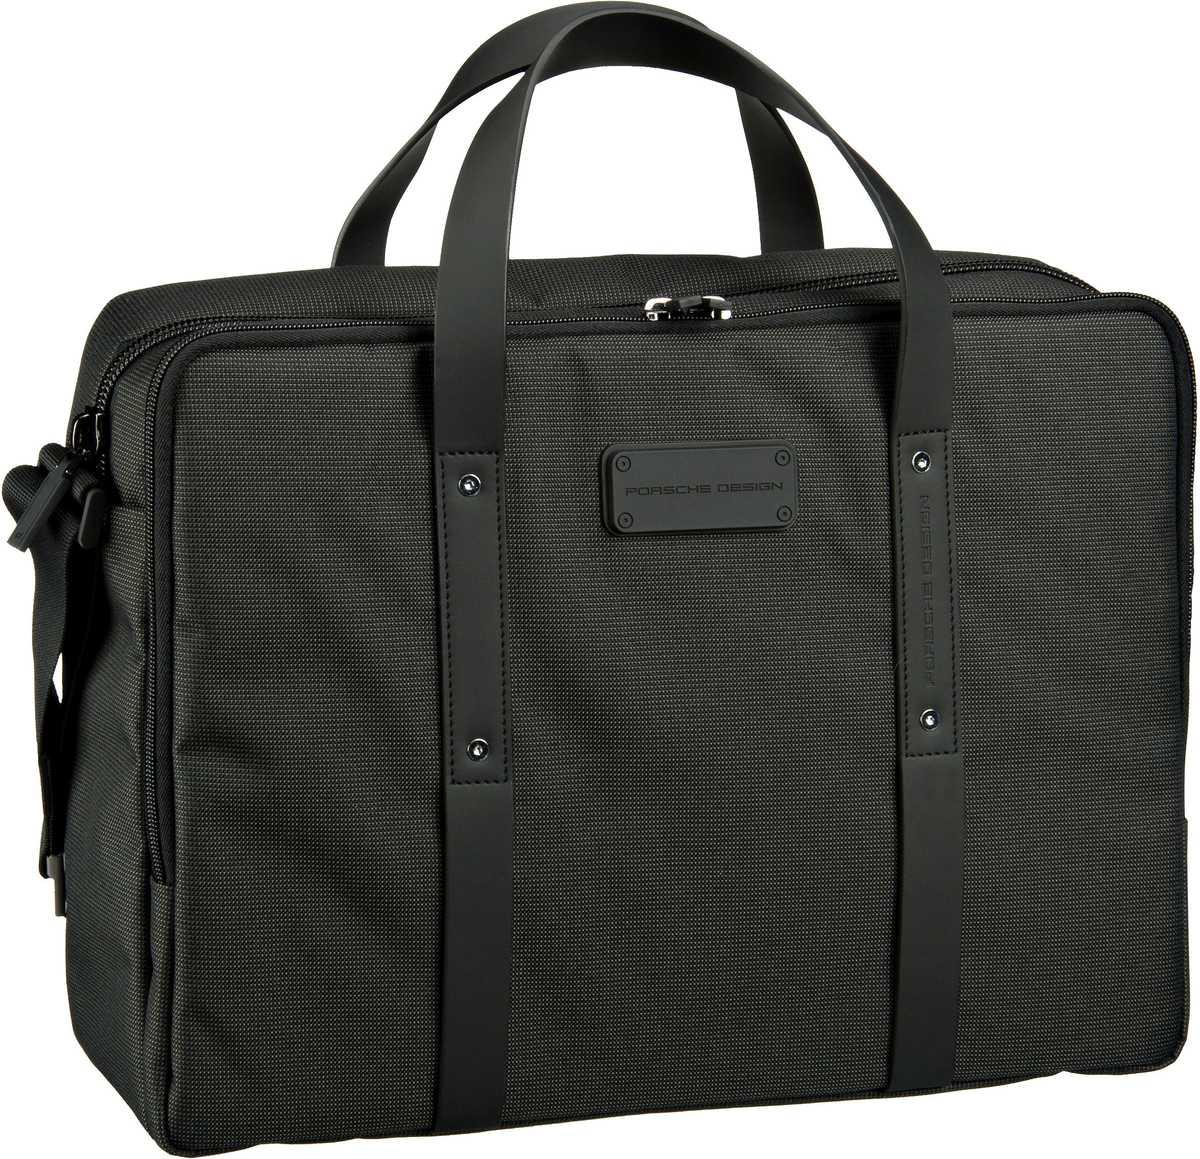 porsche design cargon briefbag m preisvergleich preis. Black Bedroom Furniture Sets. Home Design Ideas